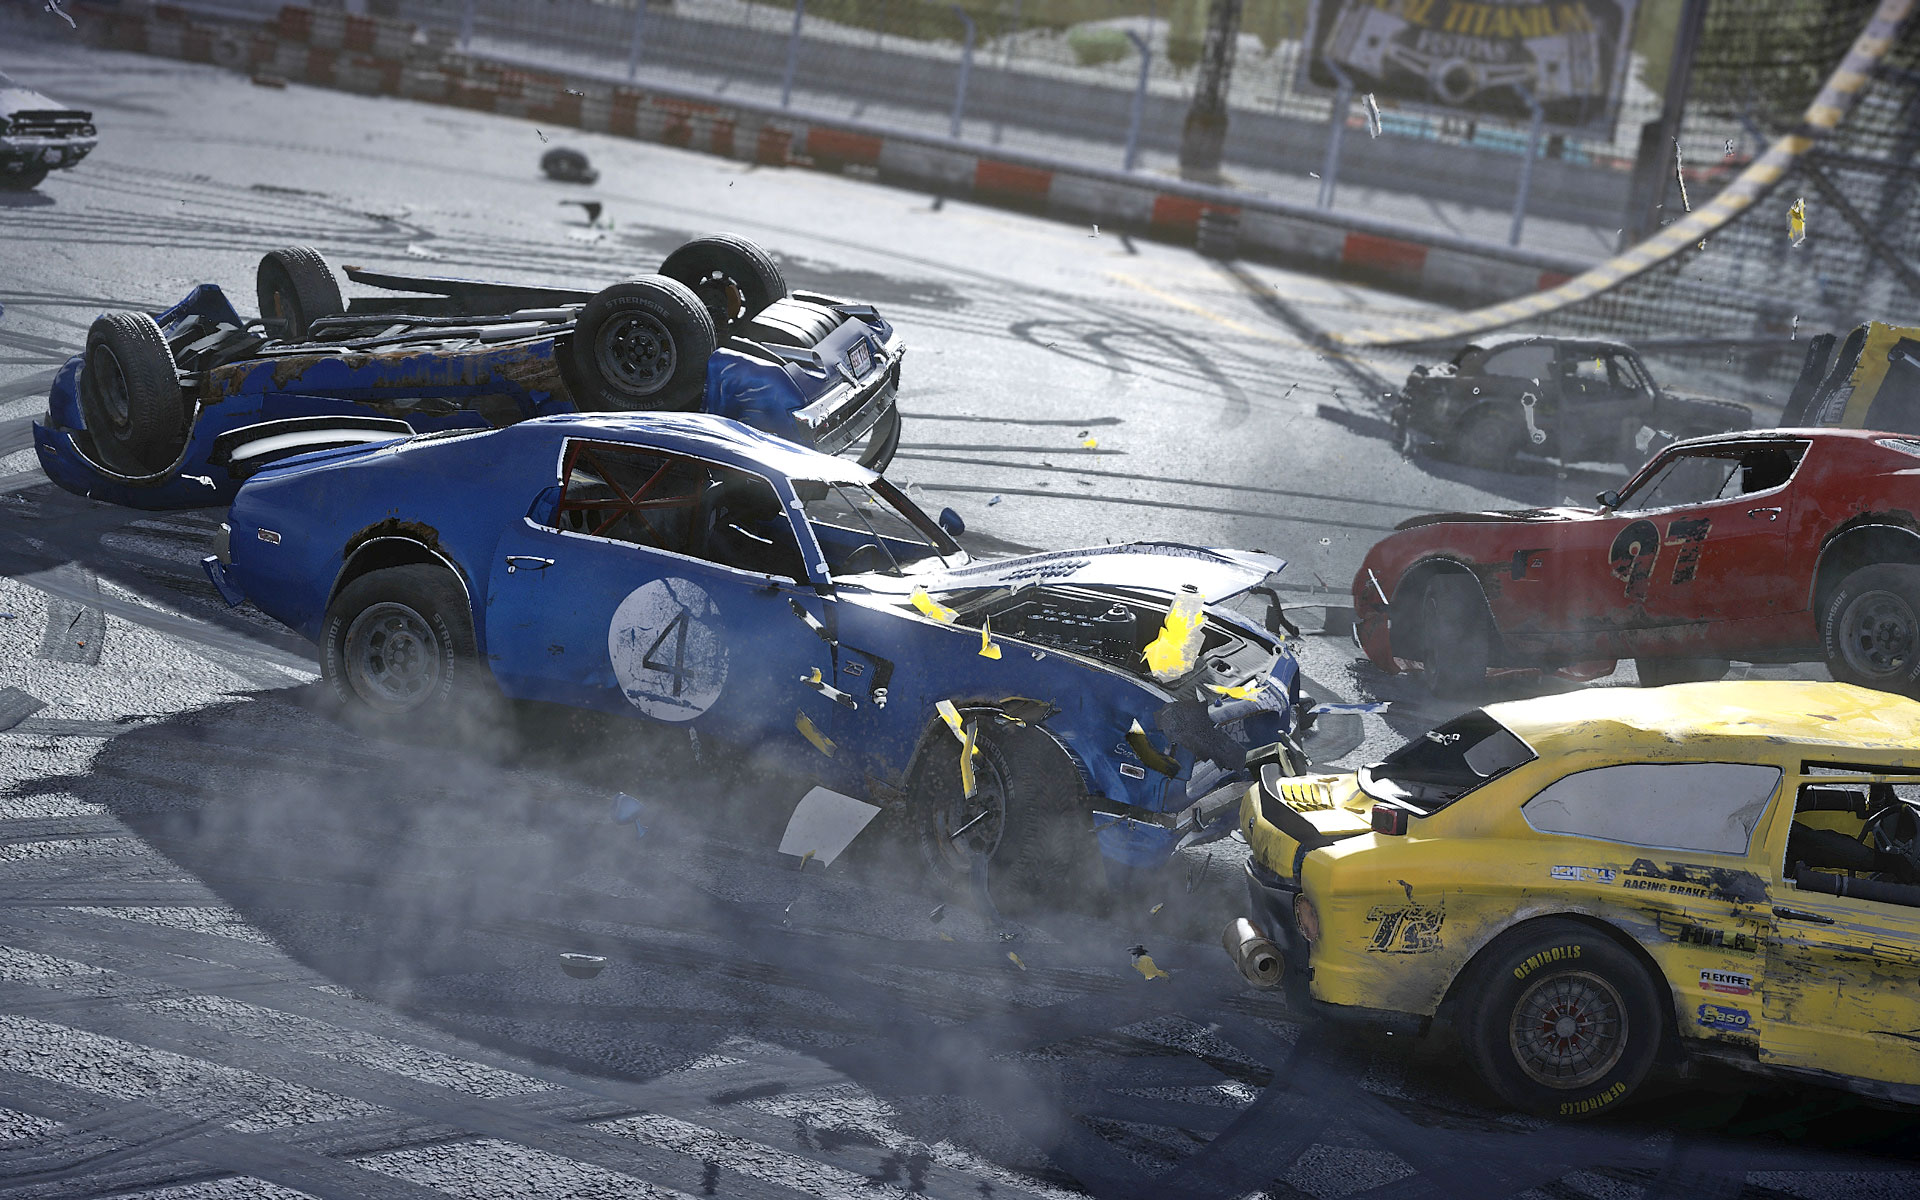 Next Car Game ahora es Wreckfest